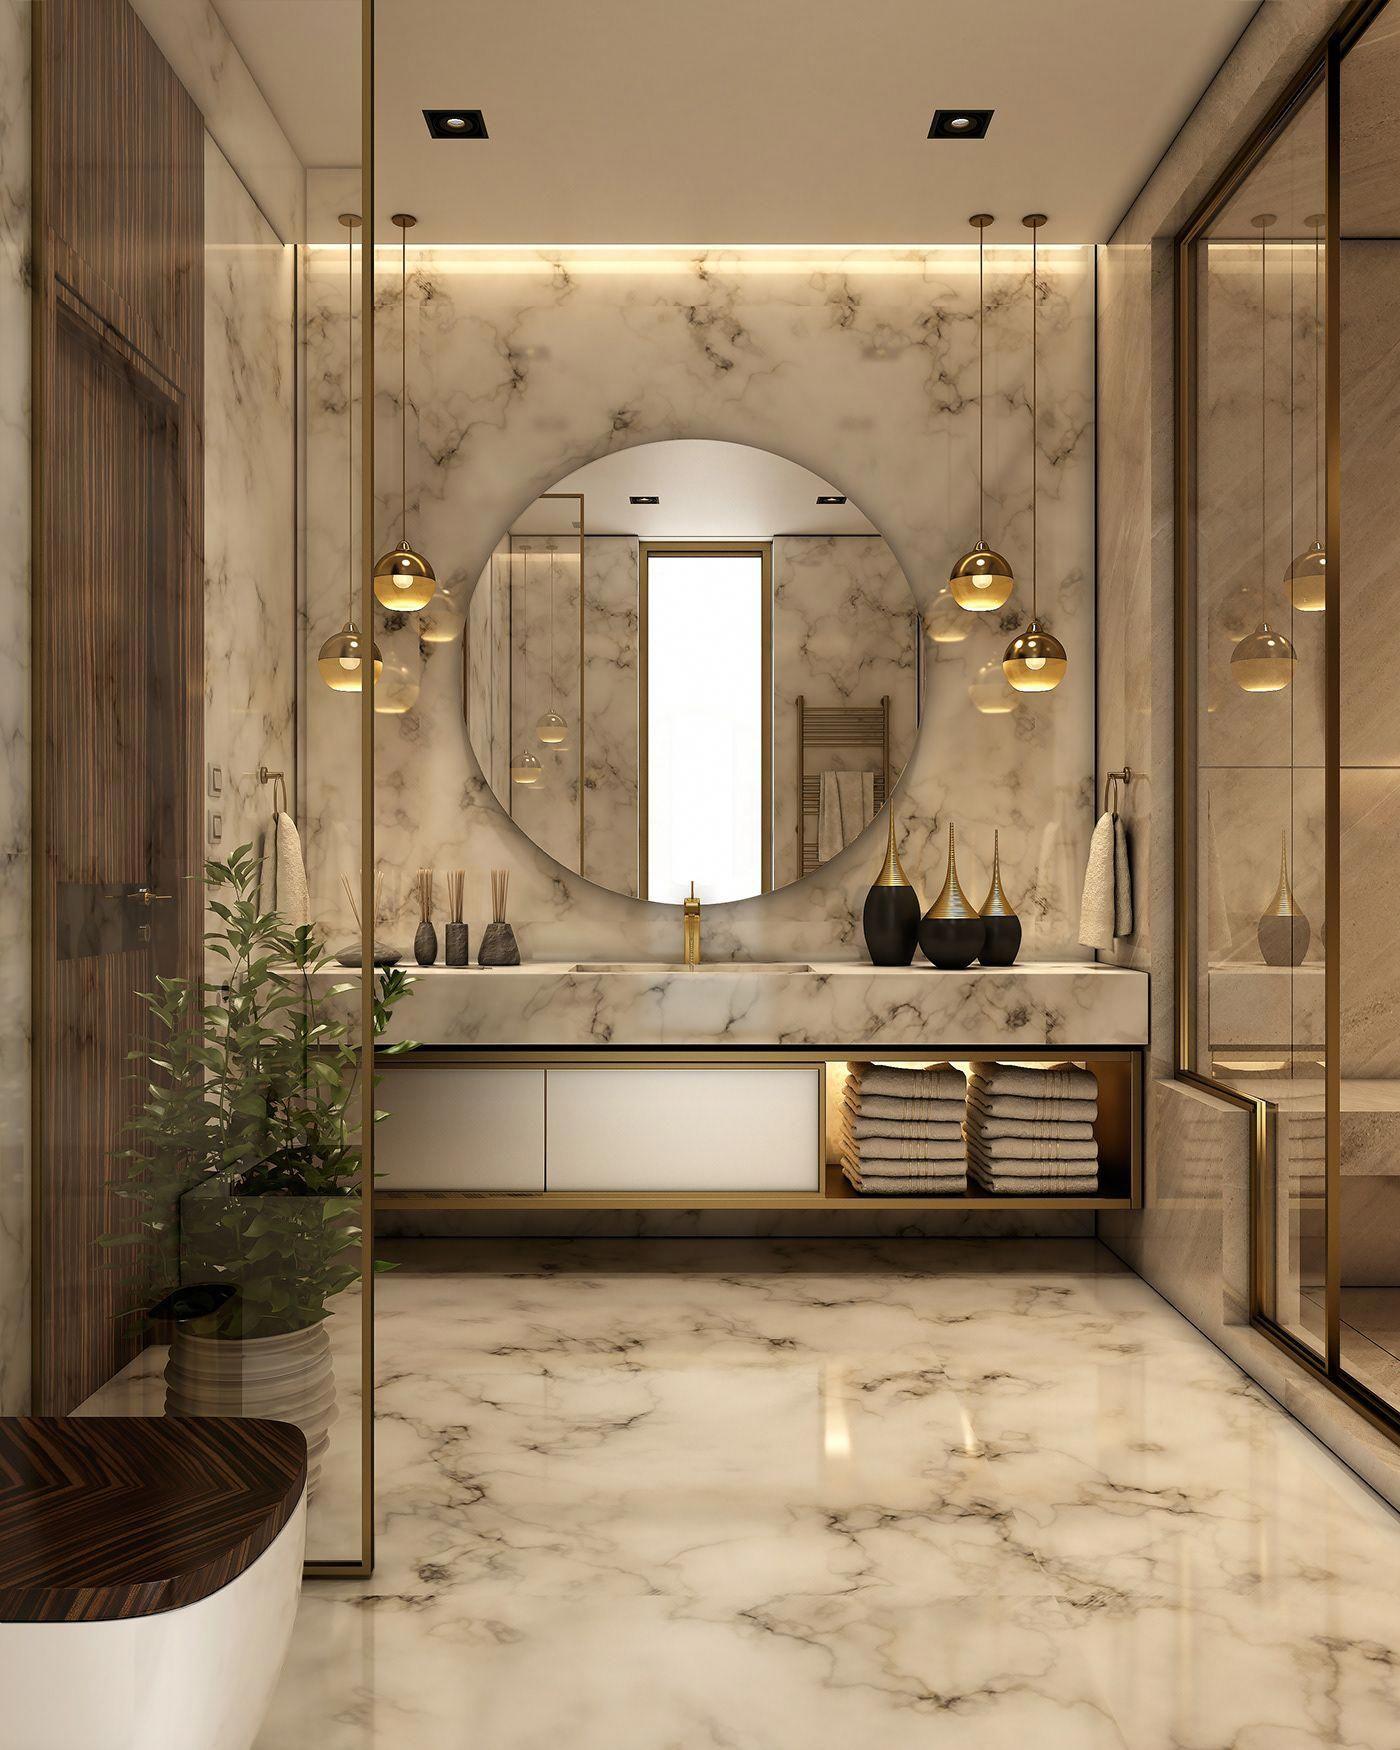 evermotion bathroom interior #bathroominteriorandexterior